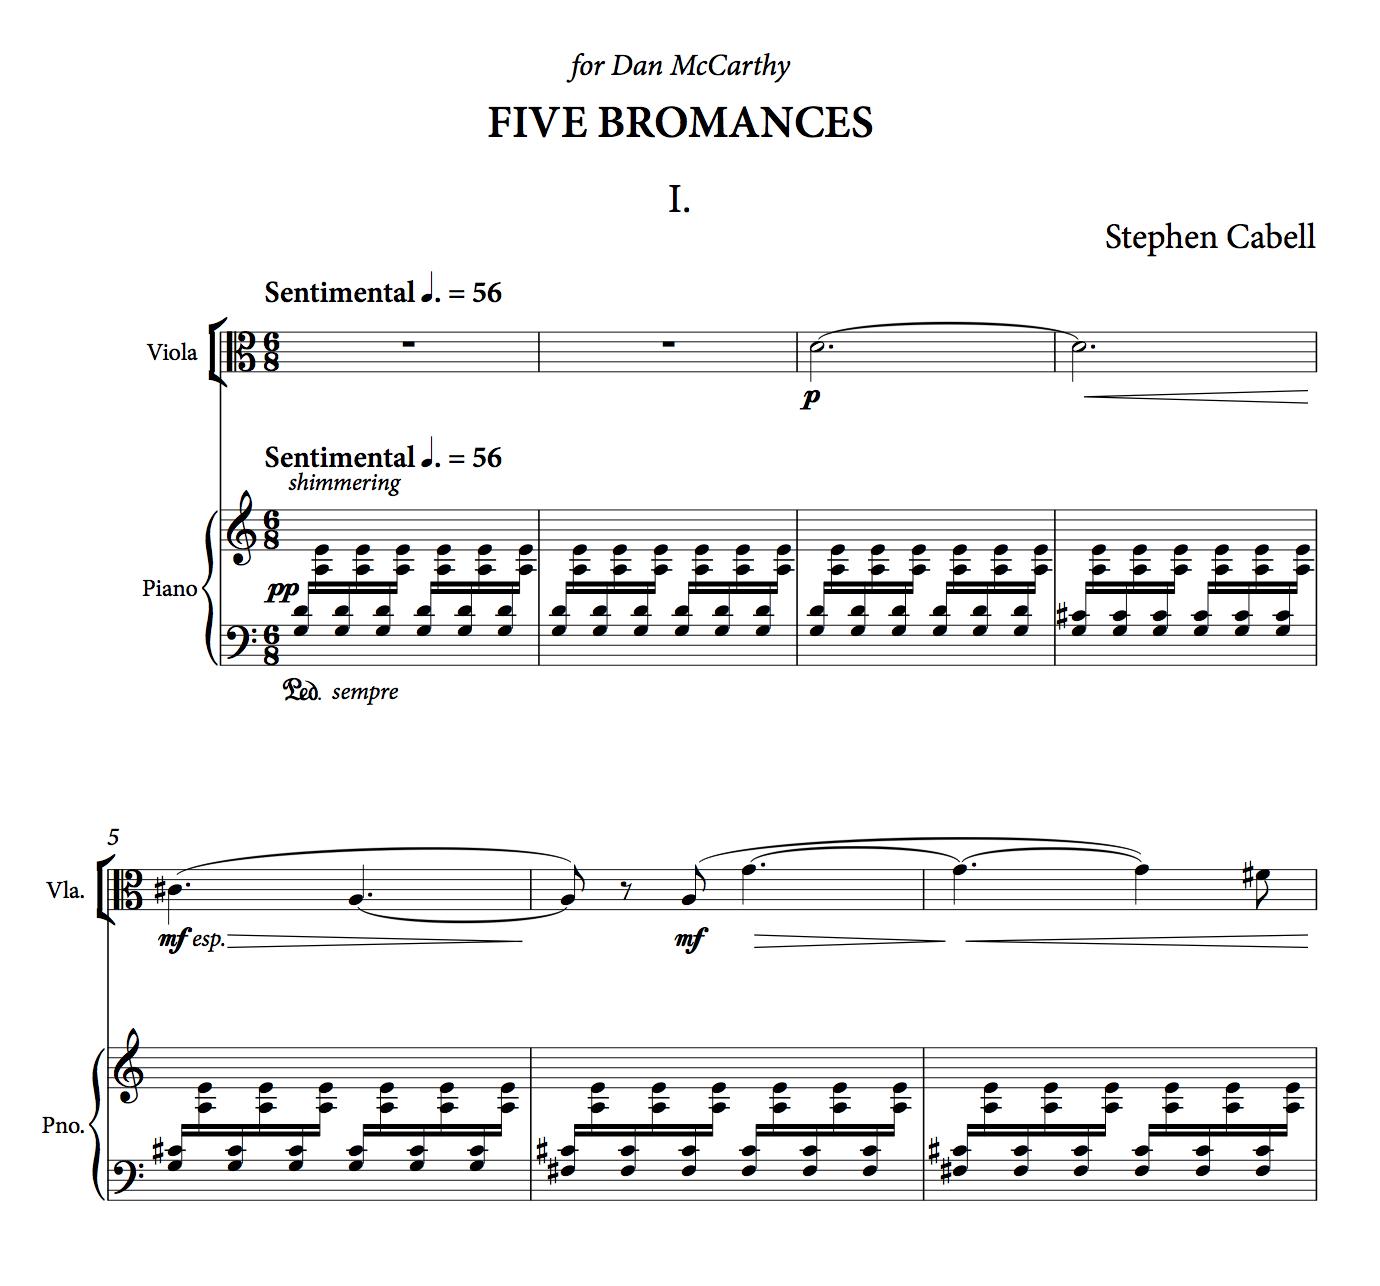 FIVE BROMANCES full score: page 1